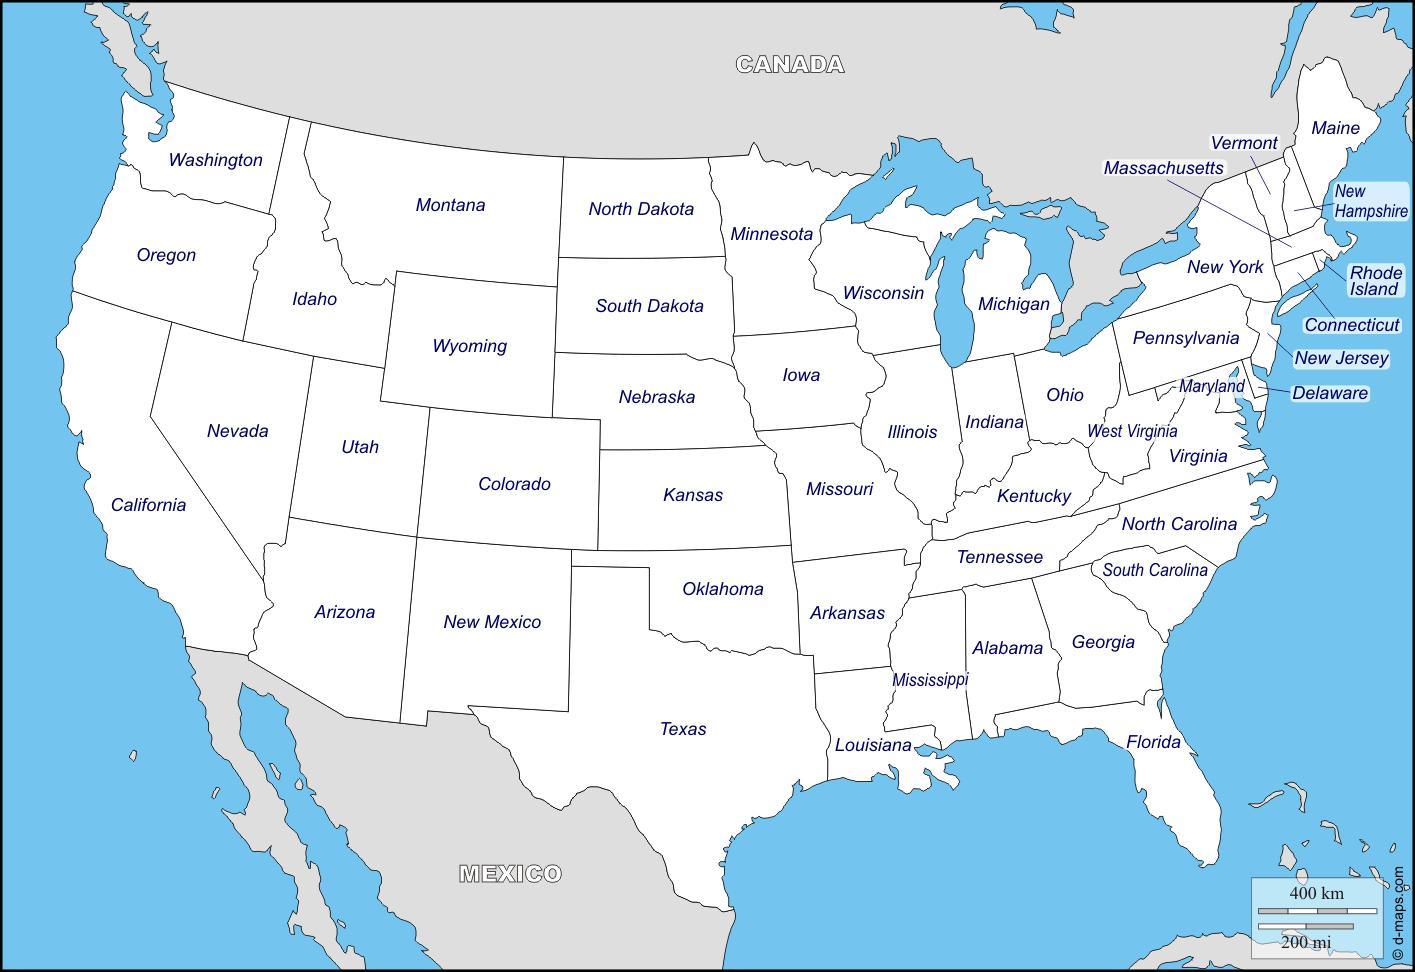 Puzzle Puzzle Maxi Mapa Usa Jednotlive Staty Hlavni Mesta 48